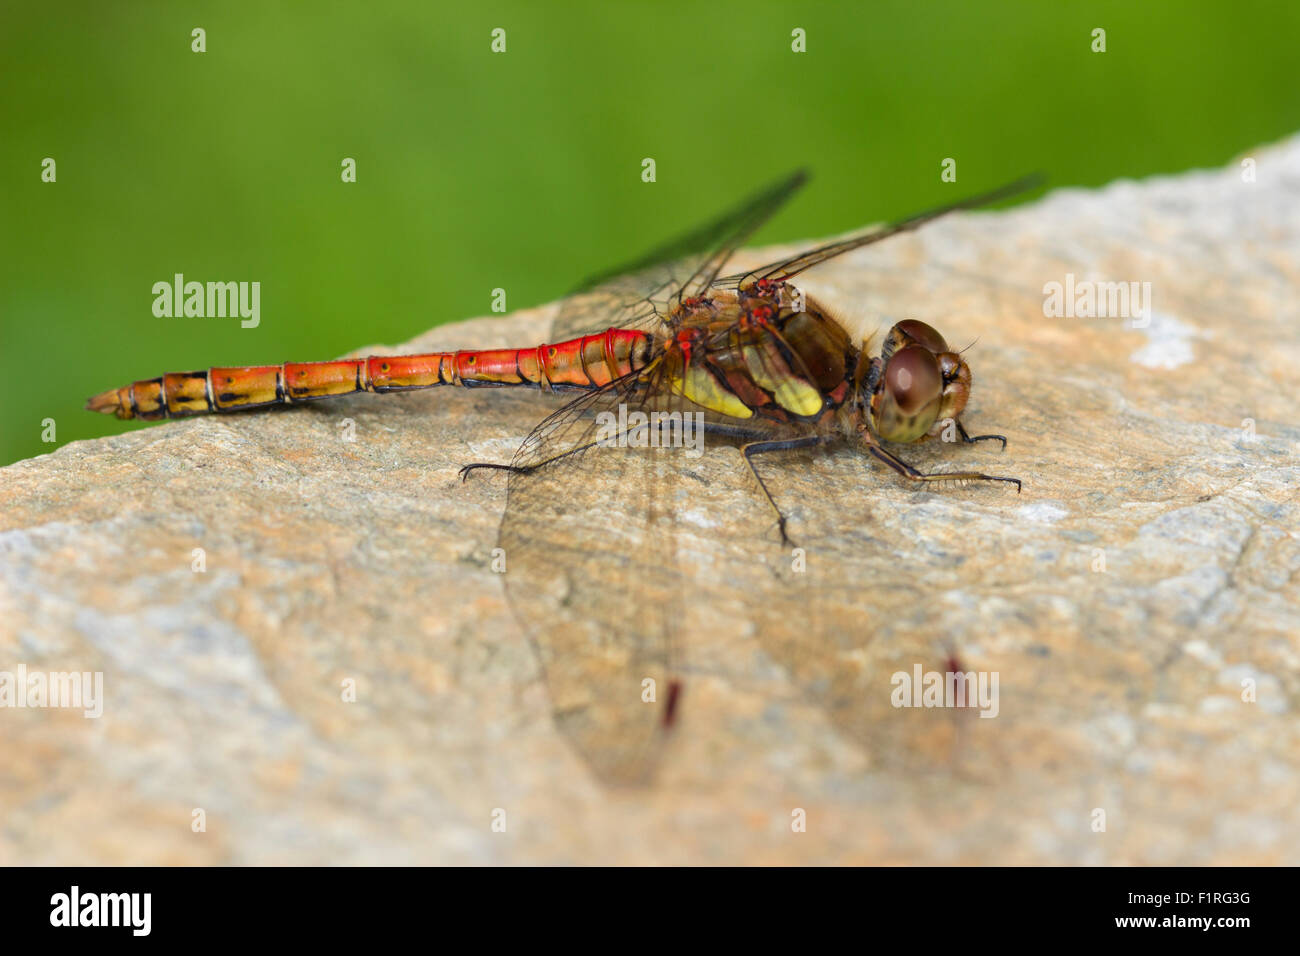 Red bodied adult male common darter dragonfly, Sympetrum striolatum, at rest in a Devon garden Stock Photo